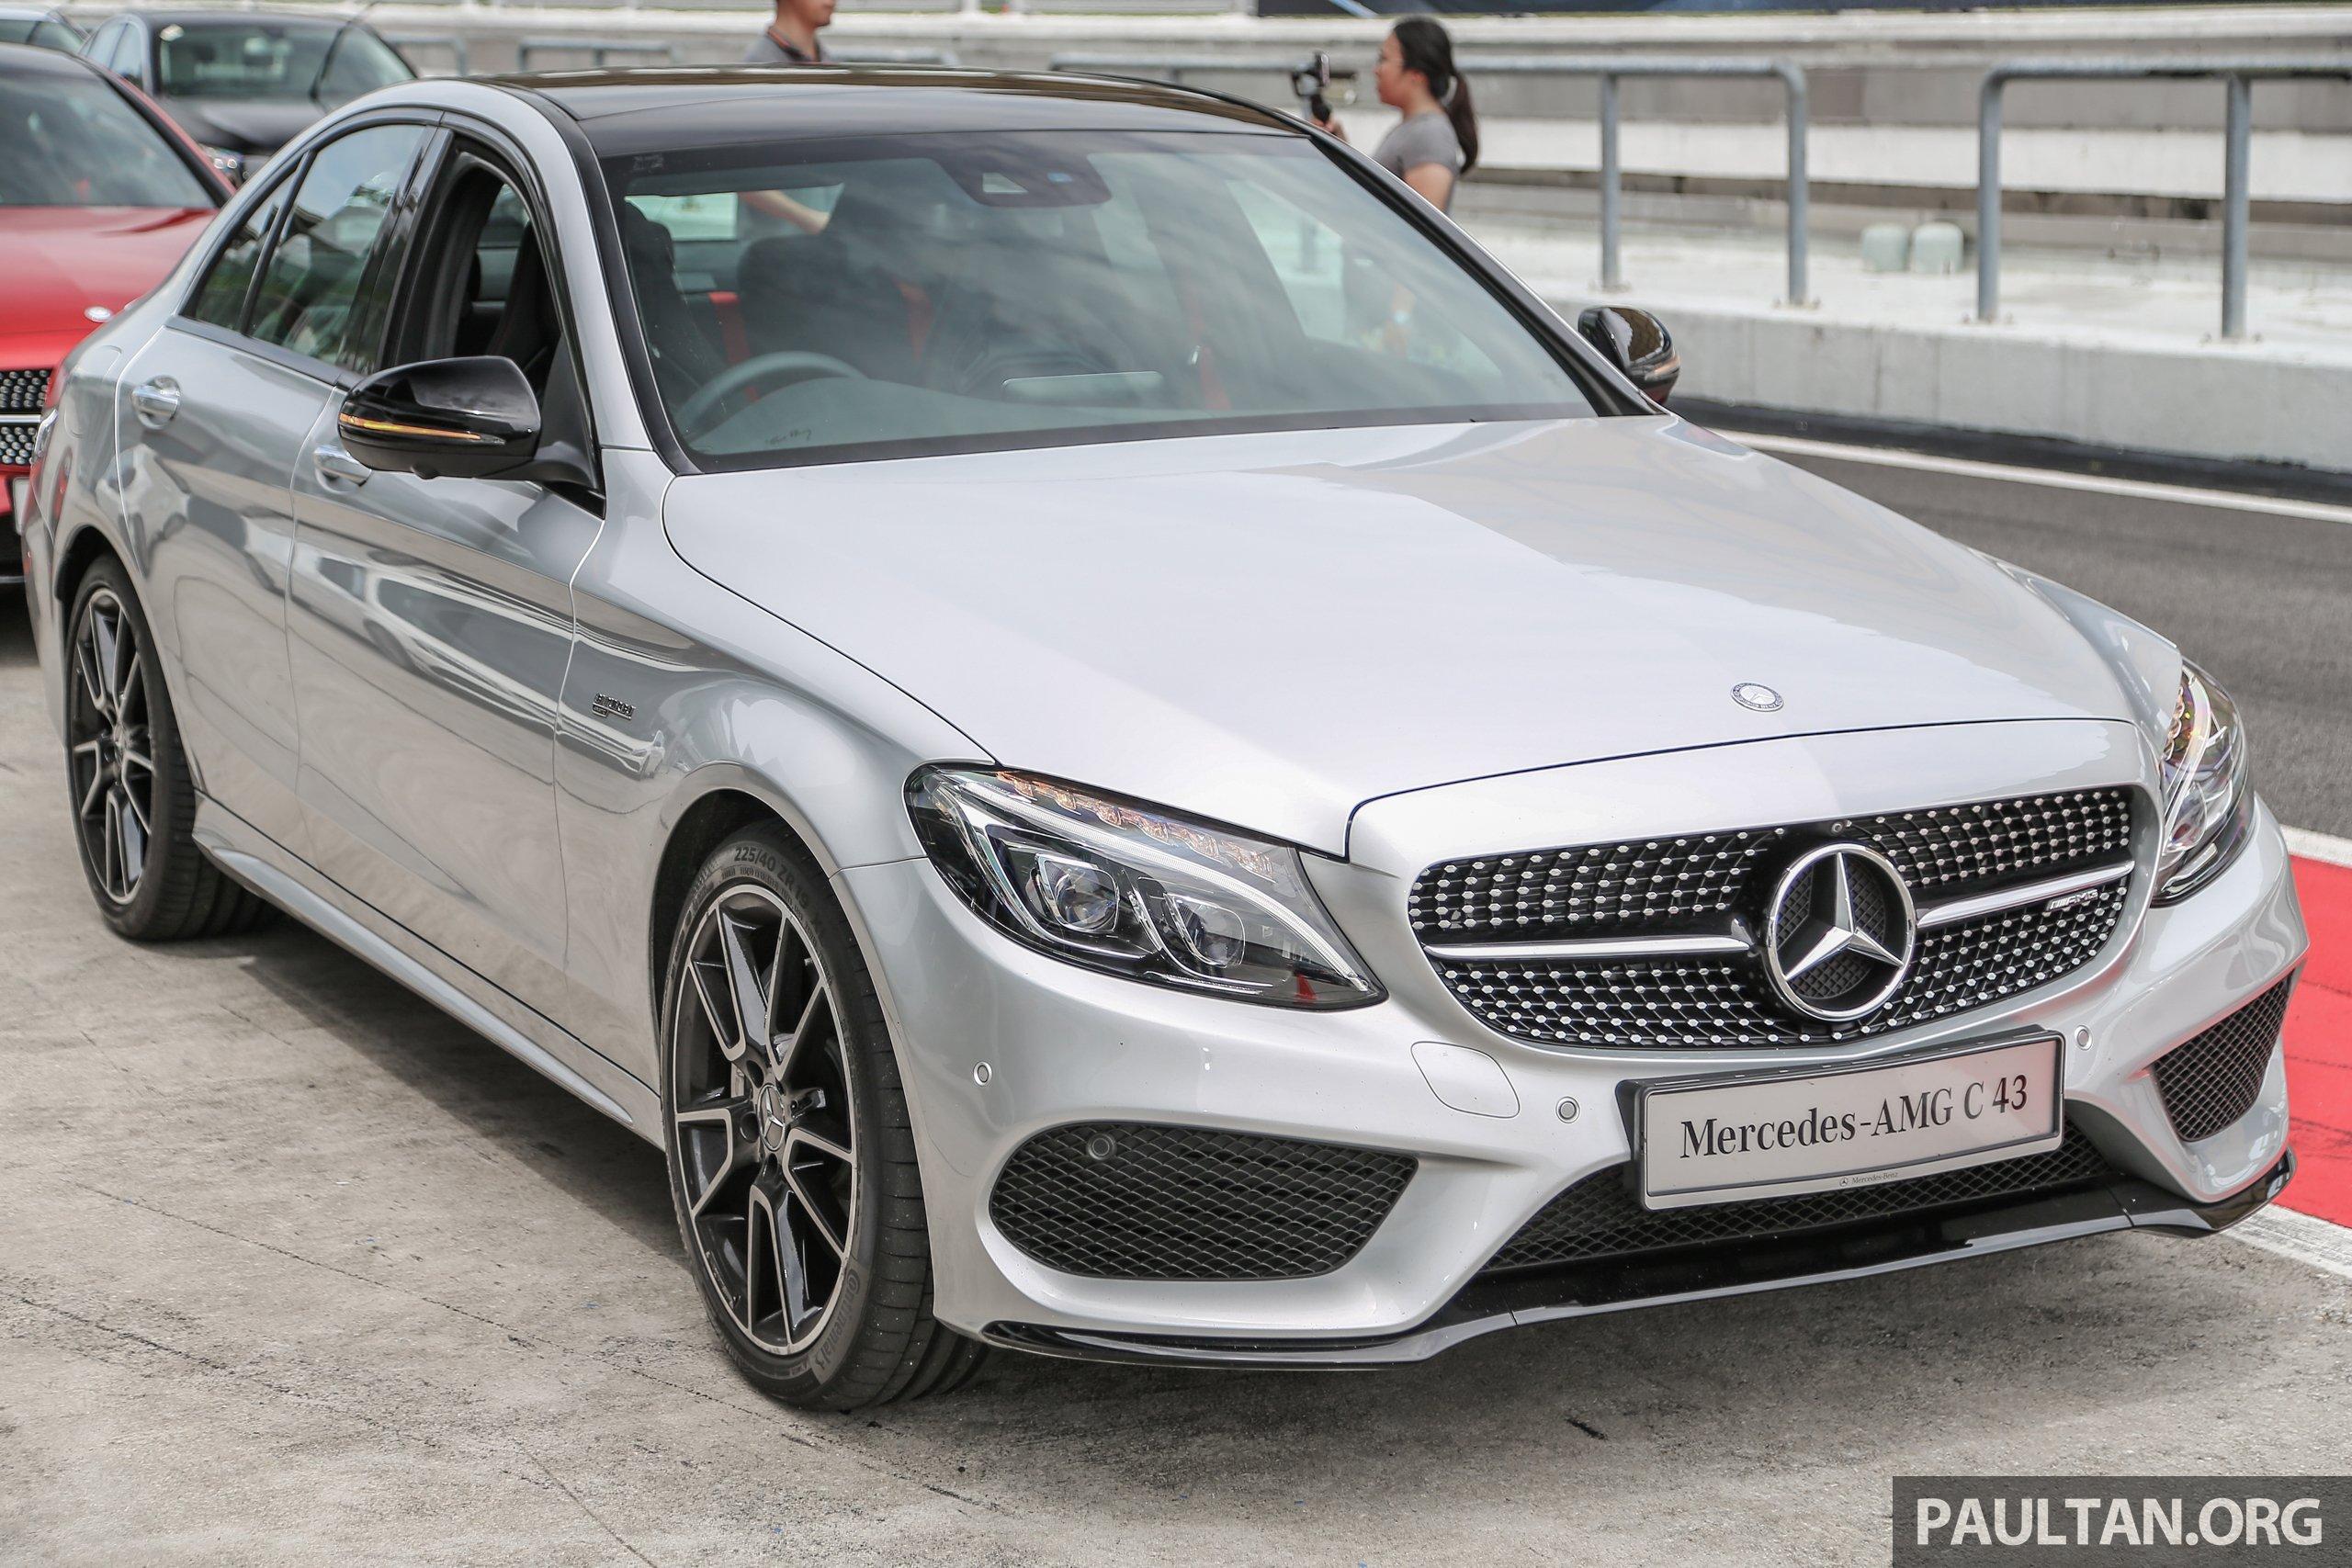 Mercedes Amg C43 与 C43 Coupe 上市,售价500k起。 Mercedes Amg C43